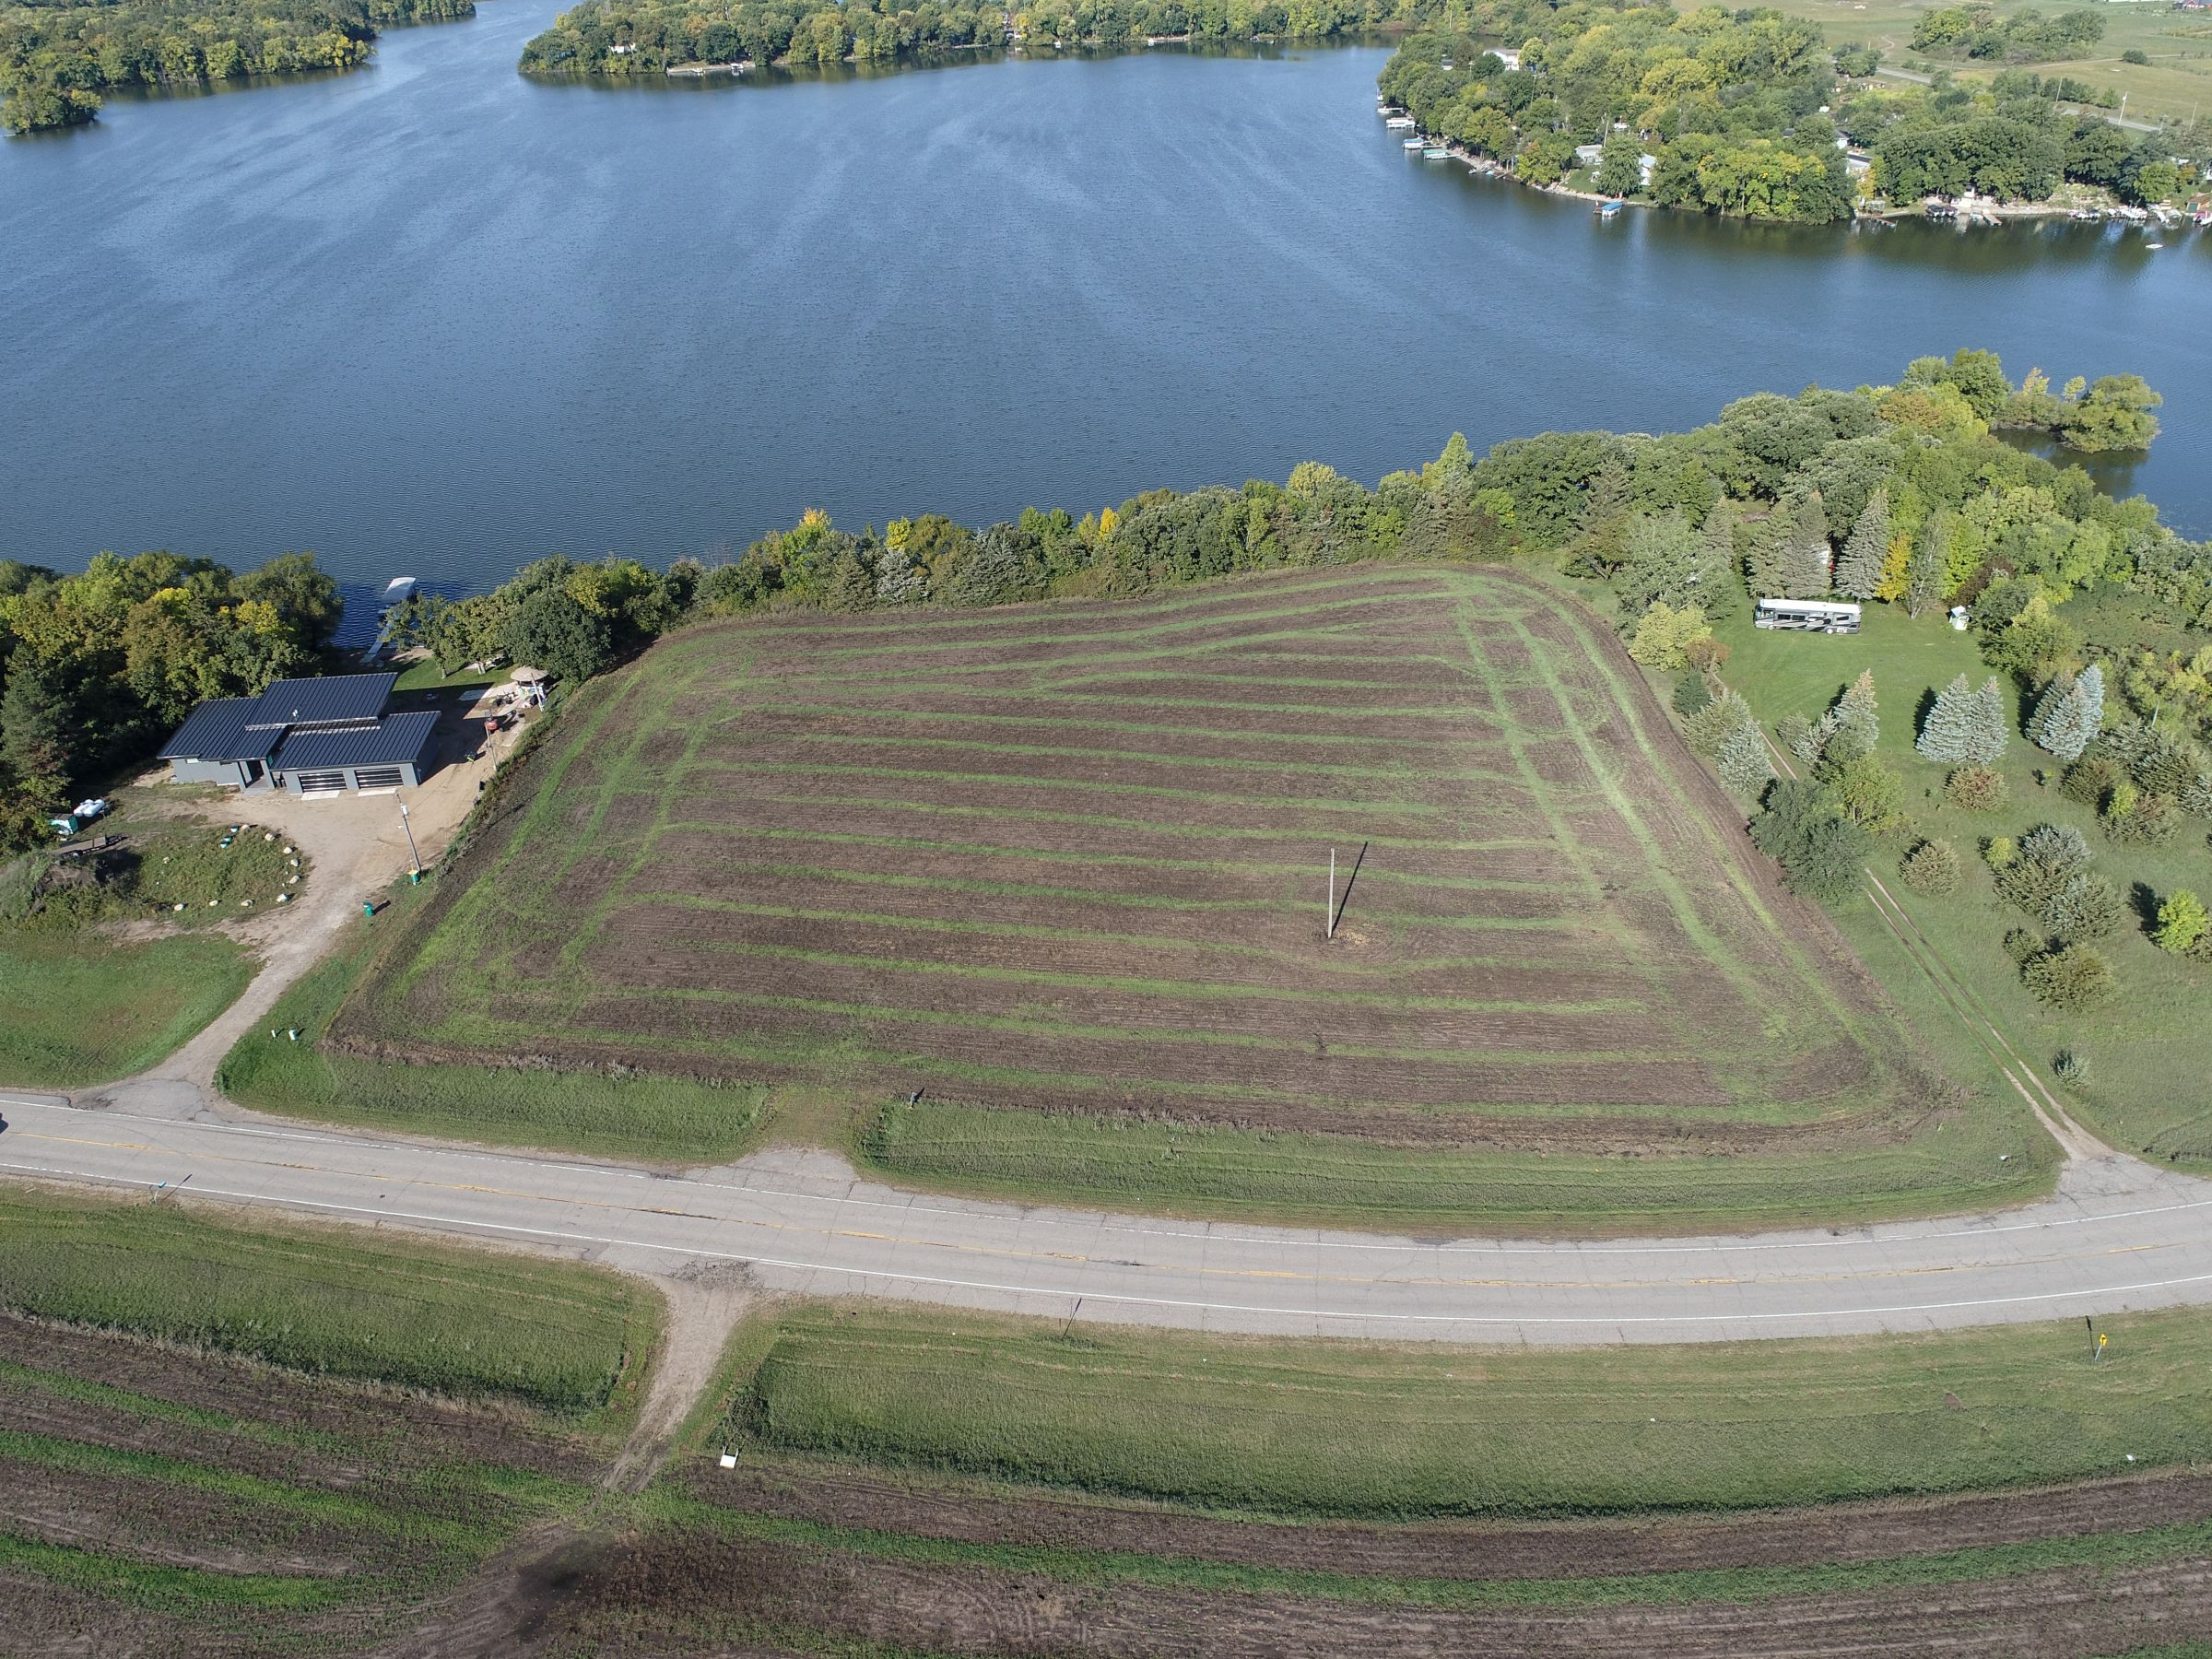 land-stearns-county-minnesota-298-acres-listing-number-15712-2-2021-09-23-123755.JPG